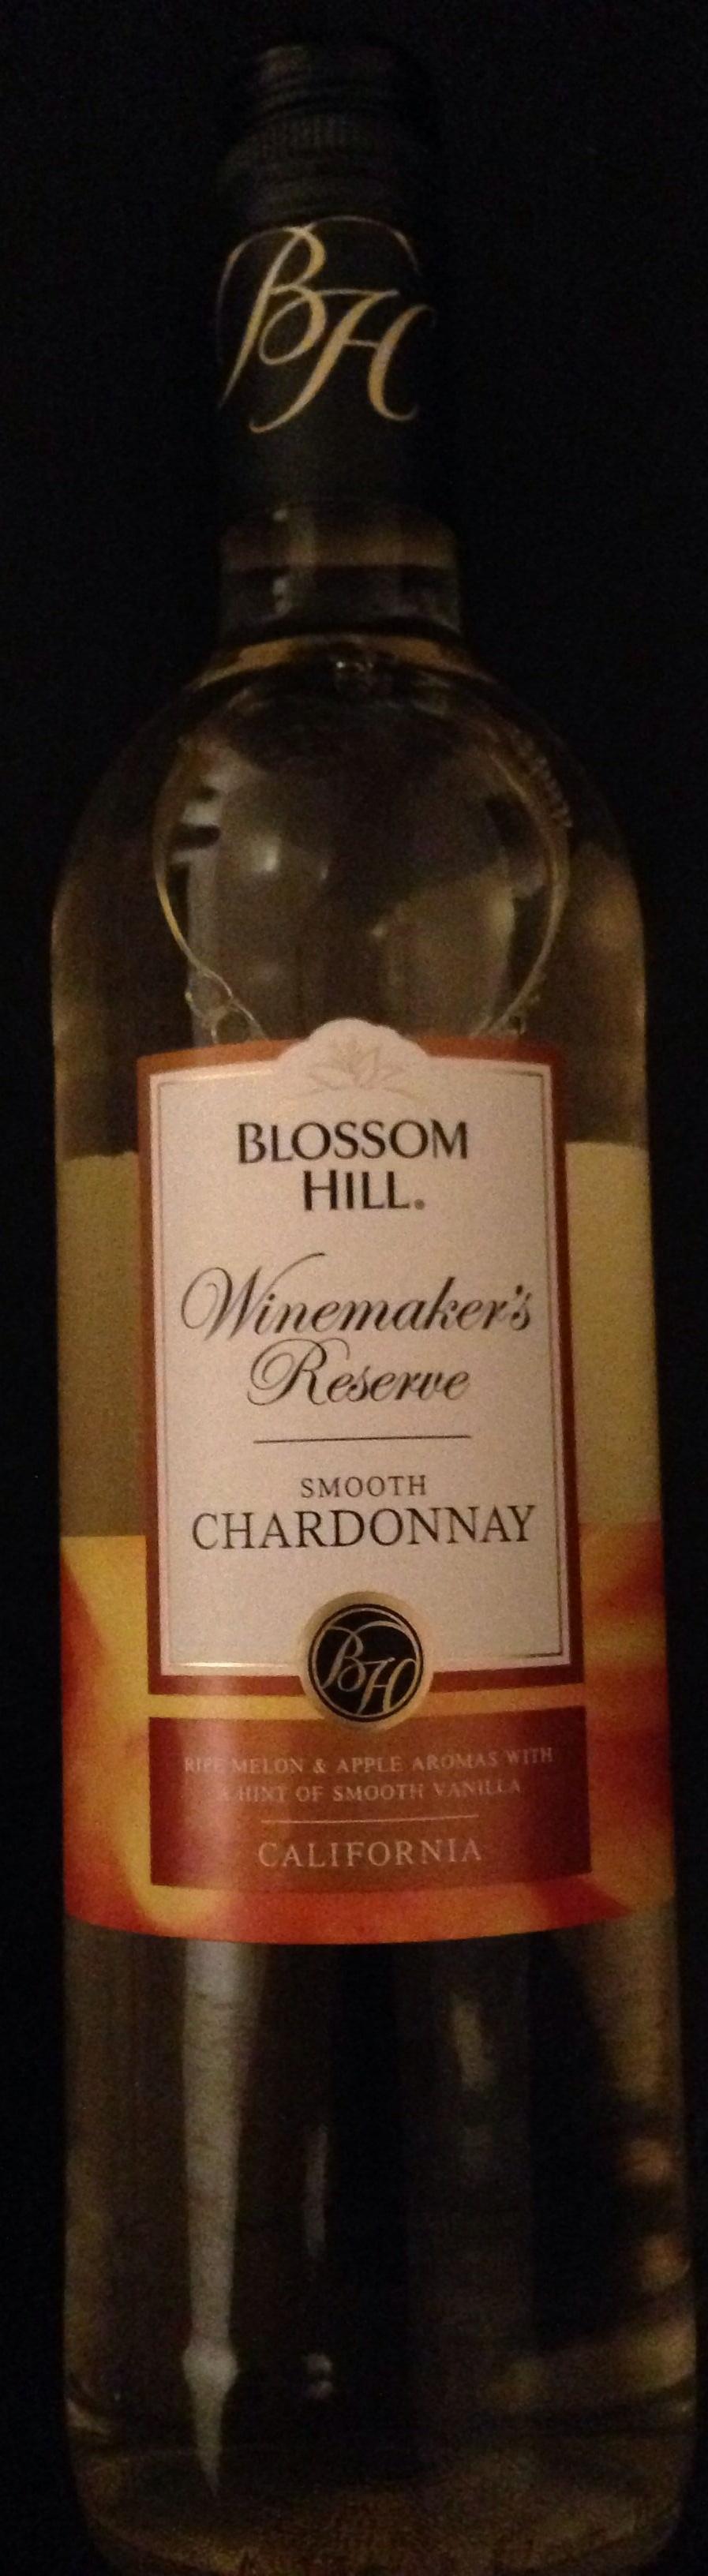 Chardonnay - Product